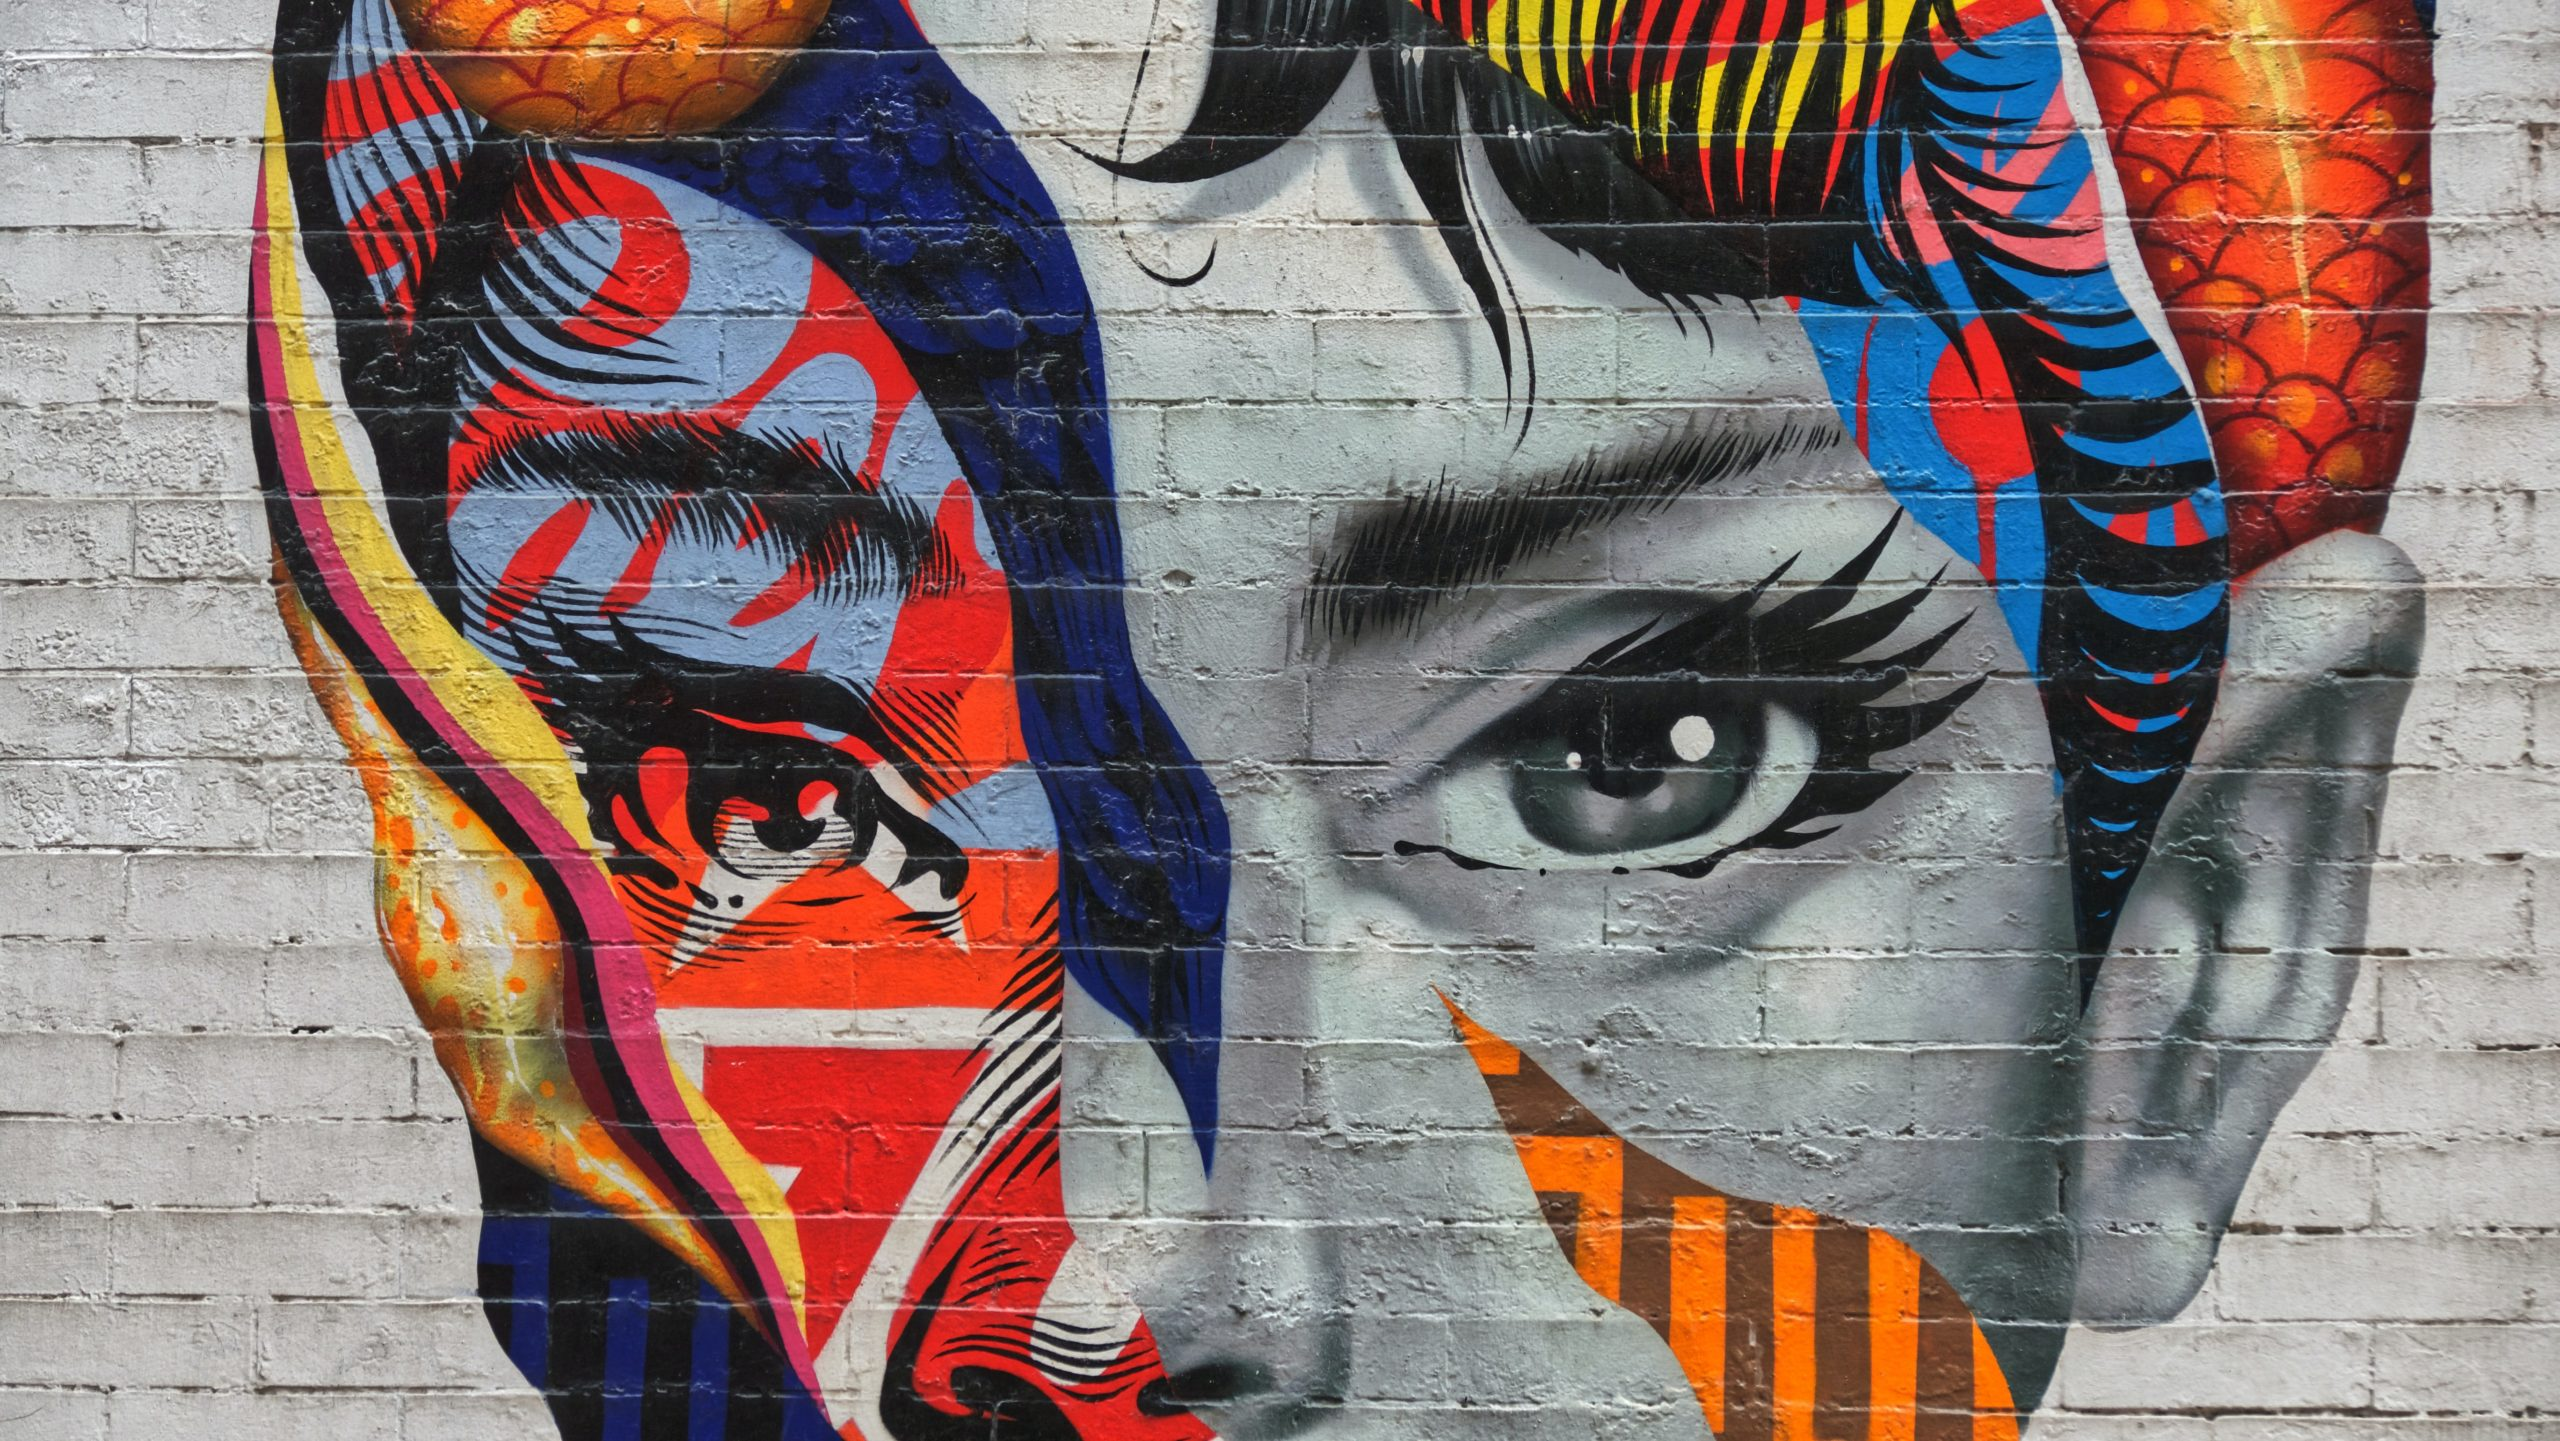 graffiti art images hd free